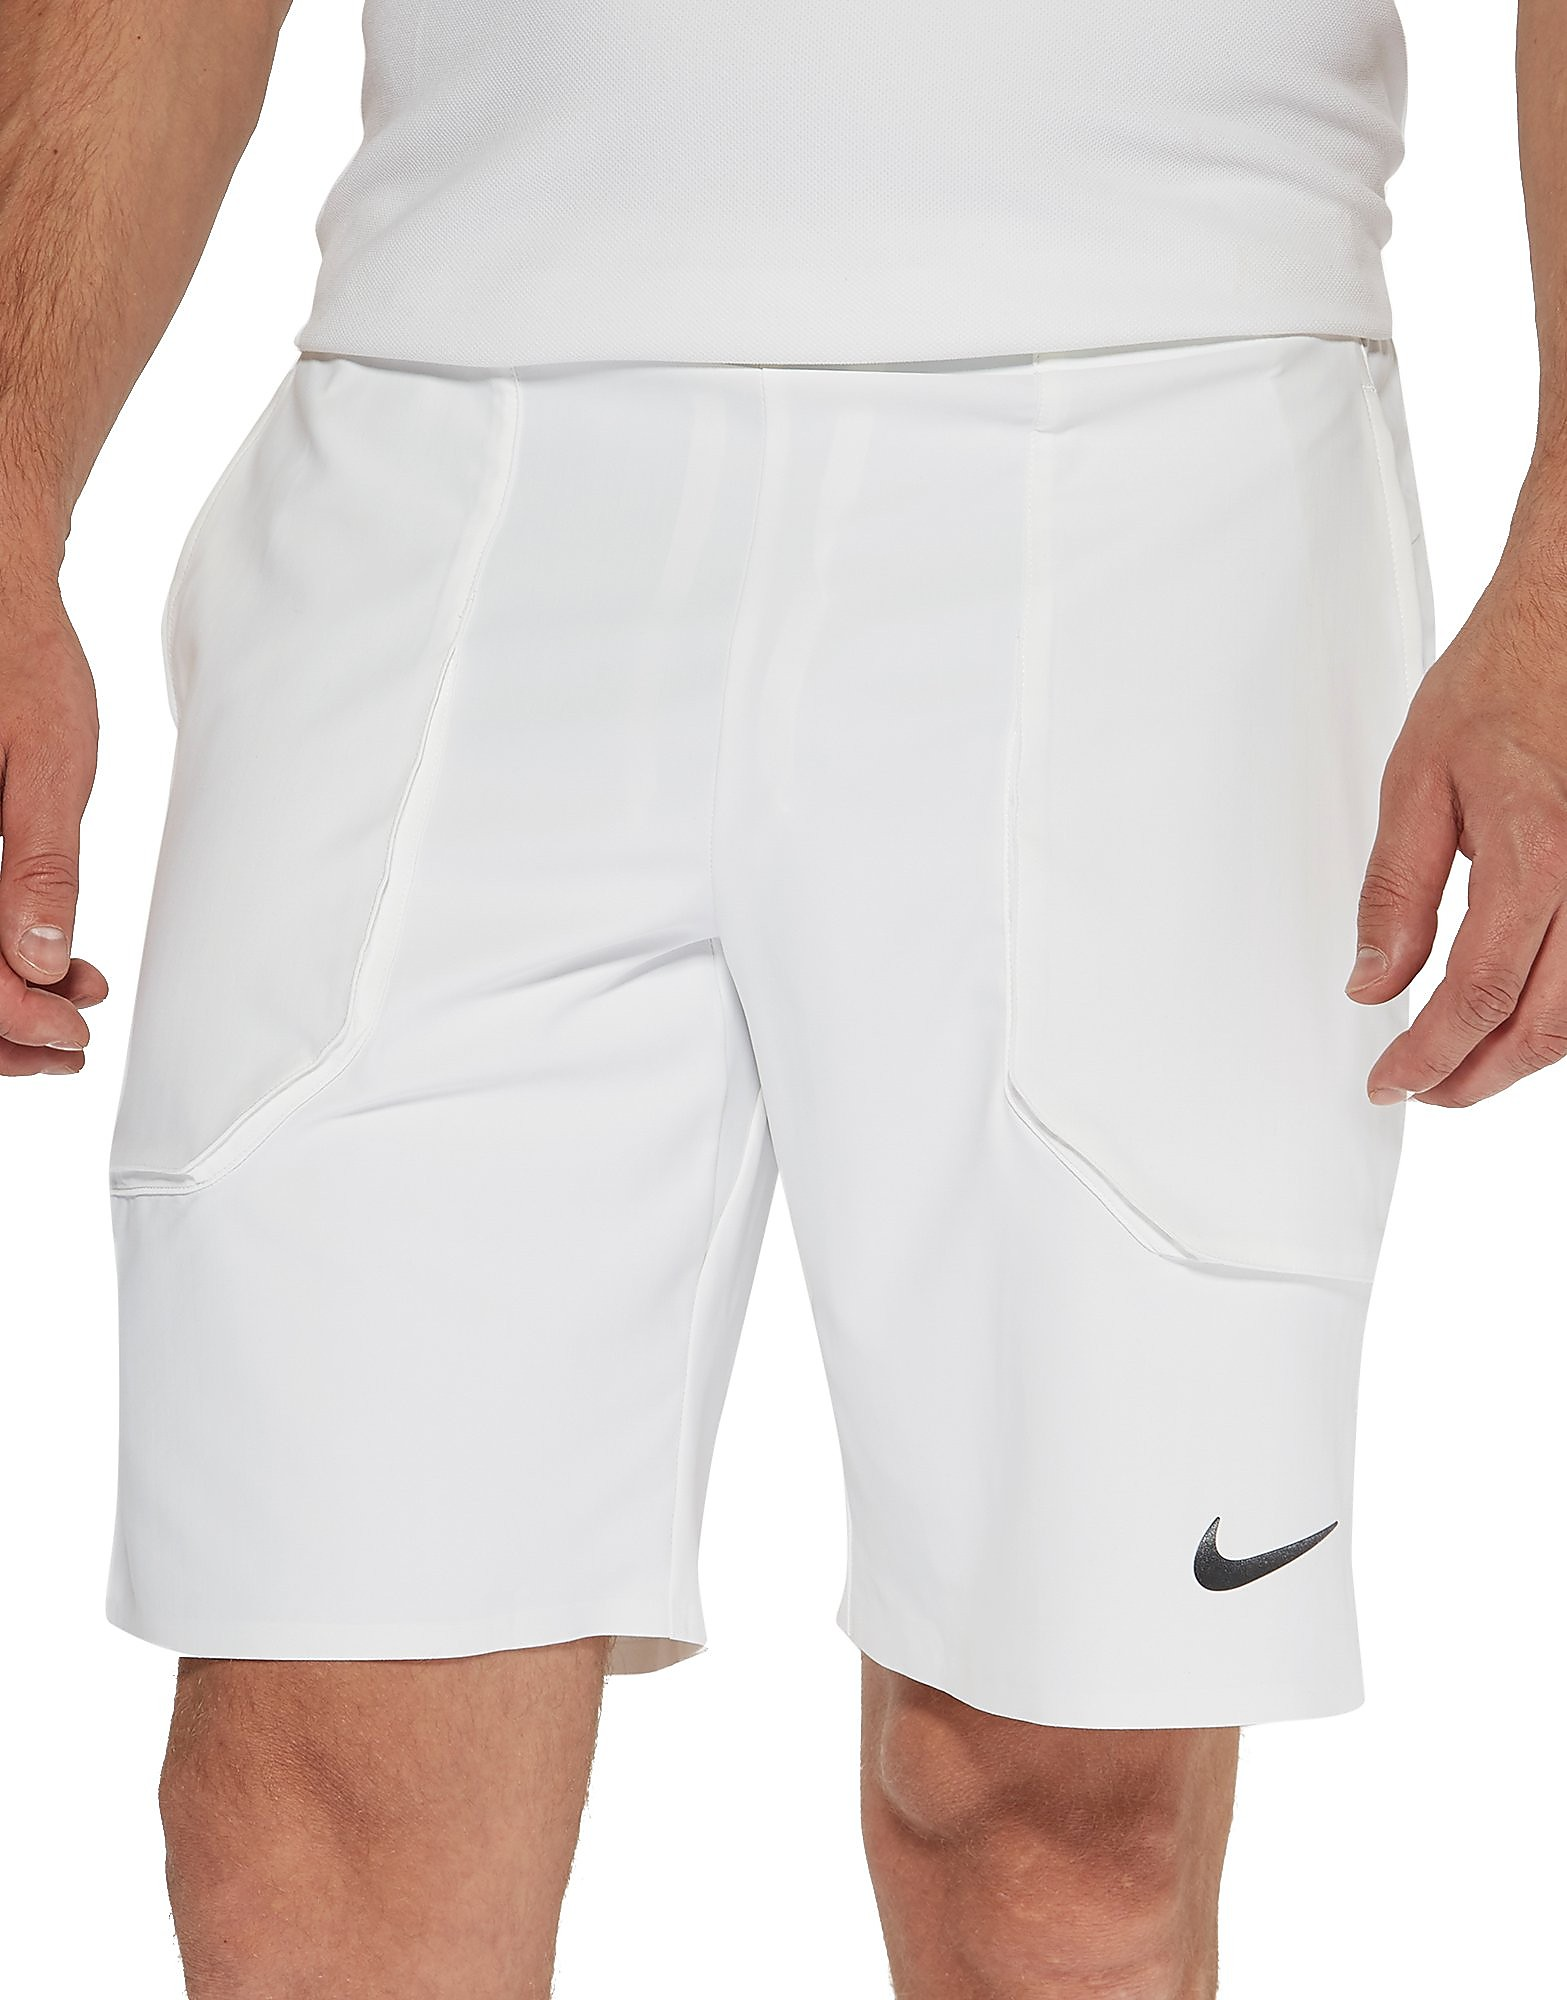 Nike Court Flex Ace Shorts